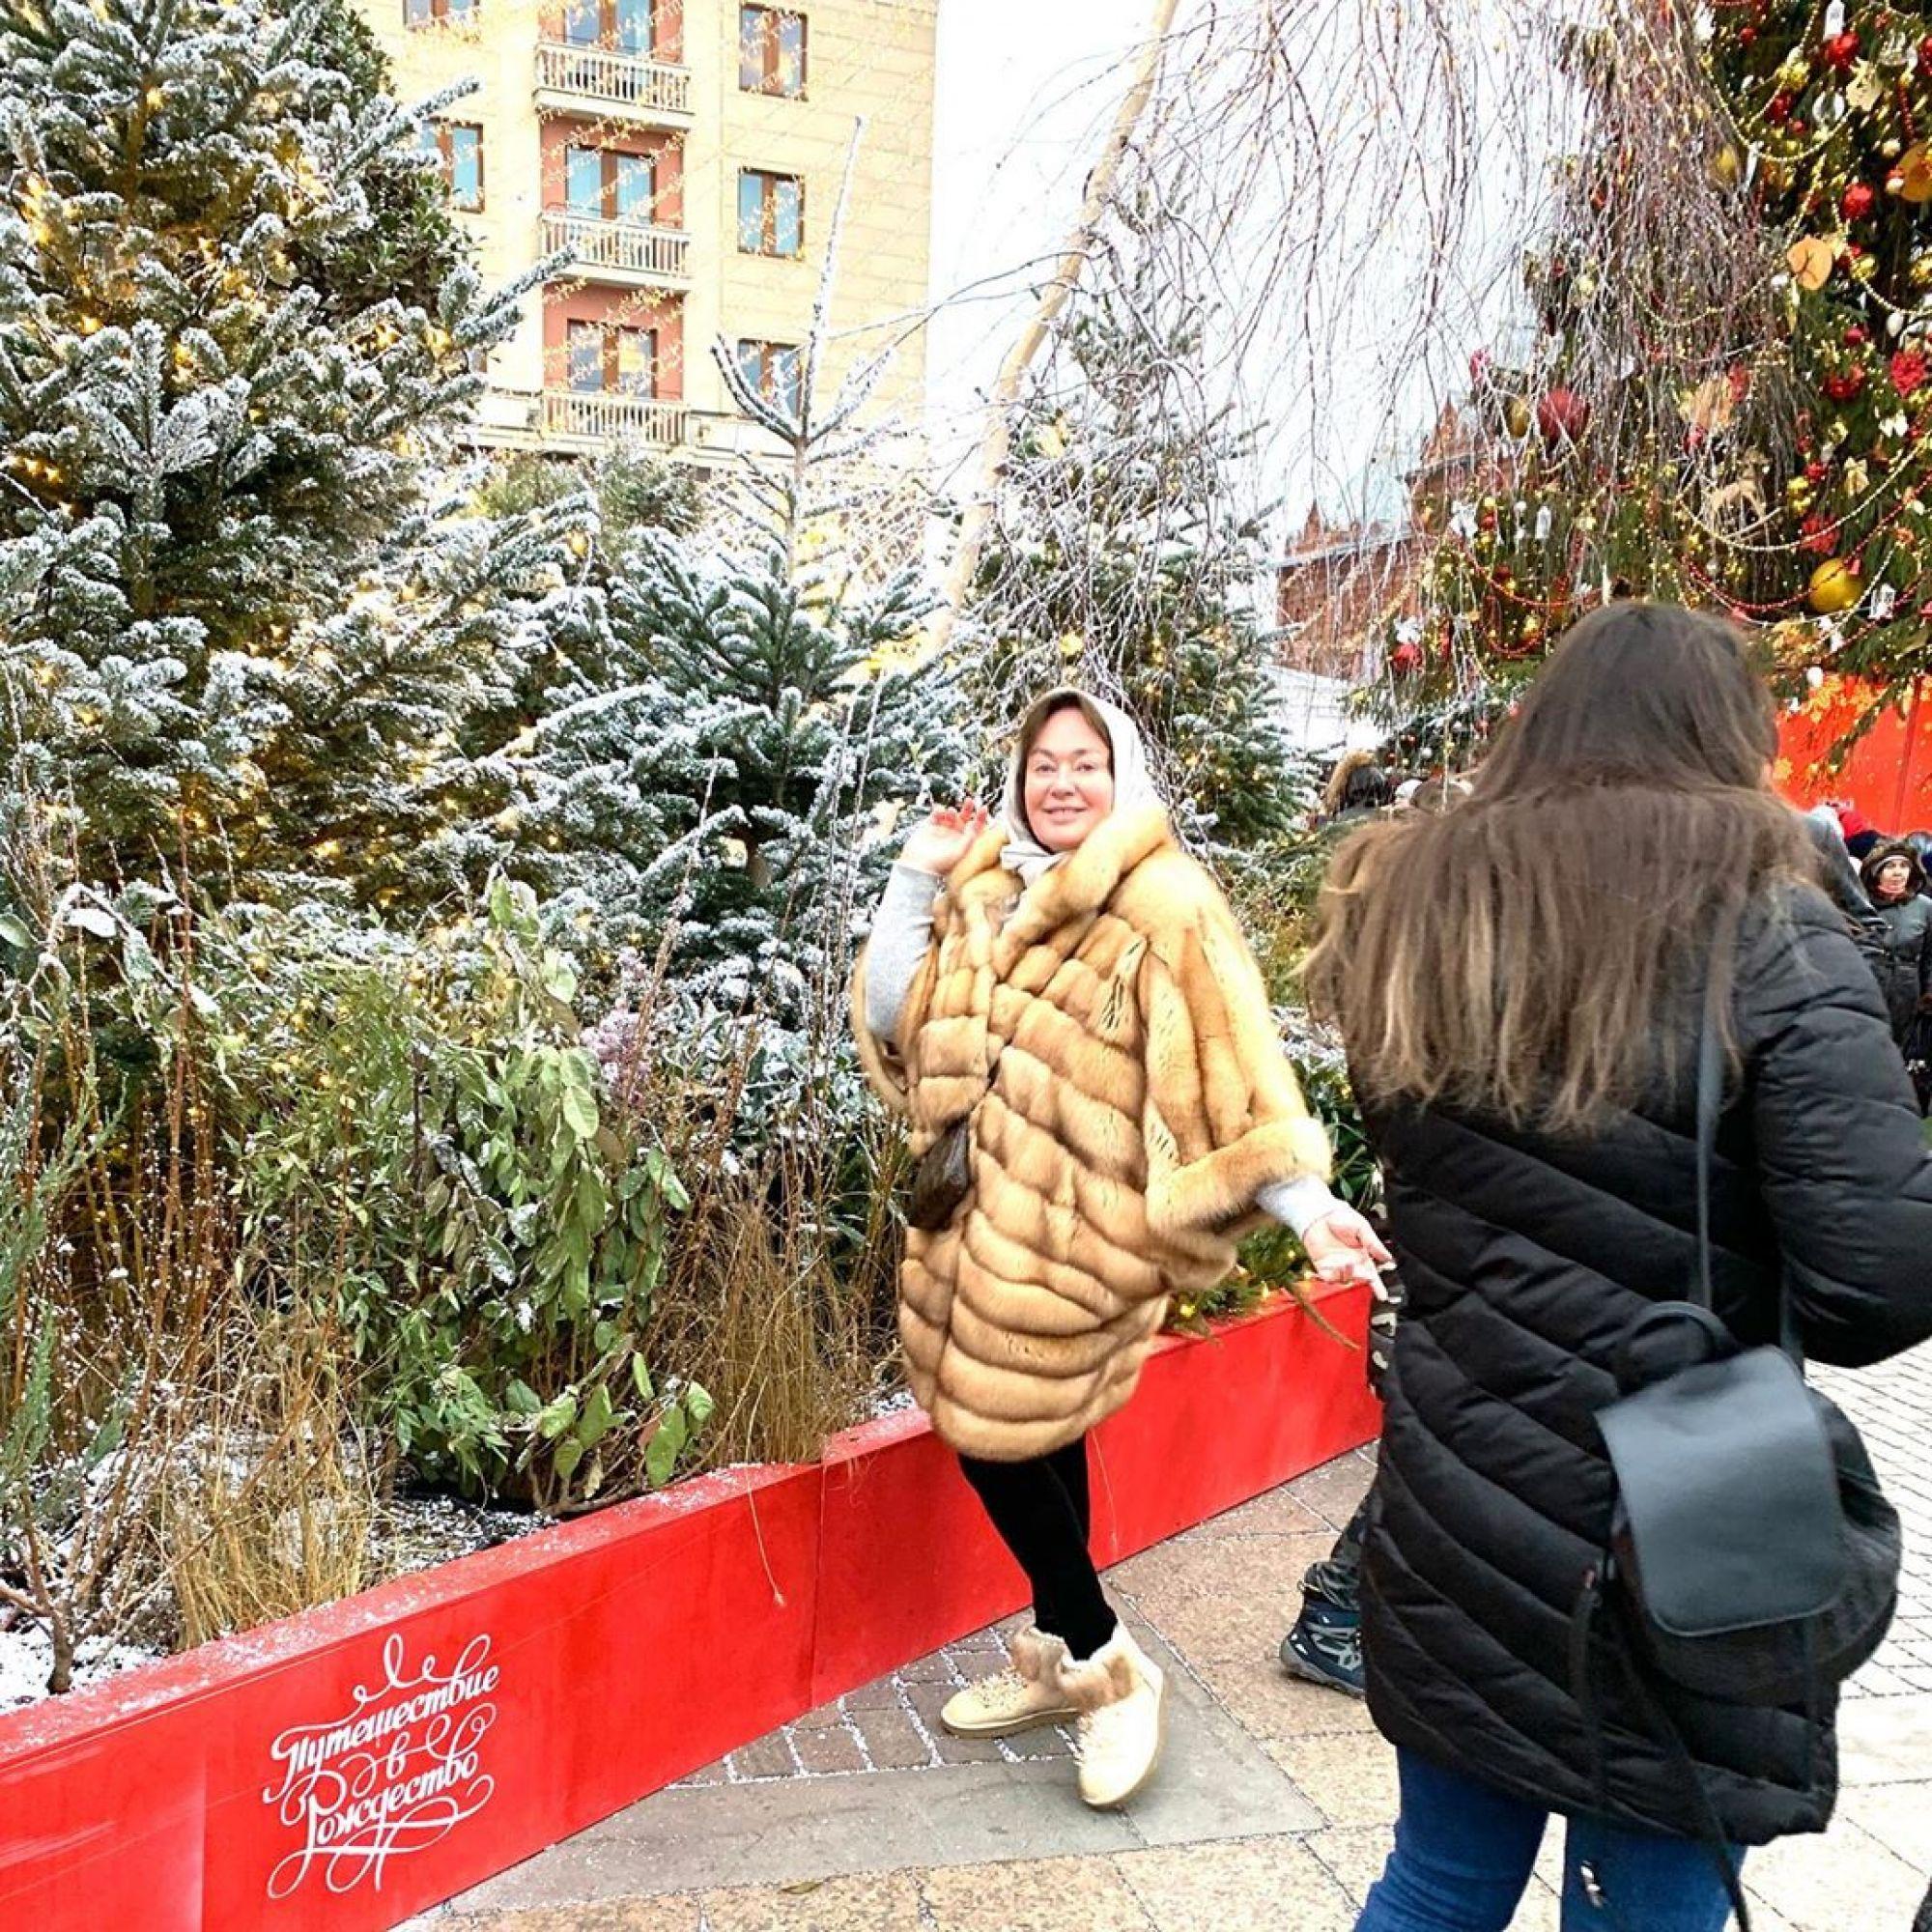 Лариса Гузеева устроила онлайн-перепалку с подписчицей